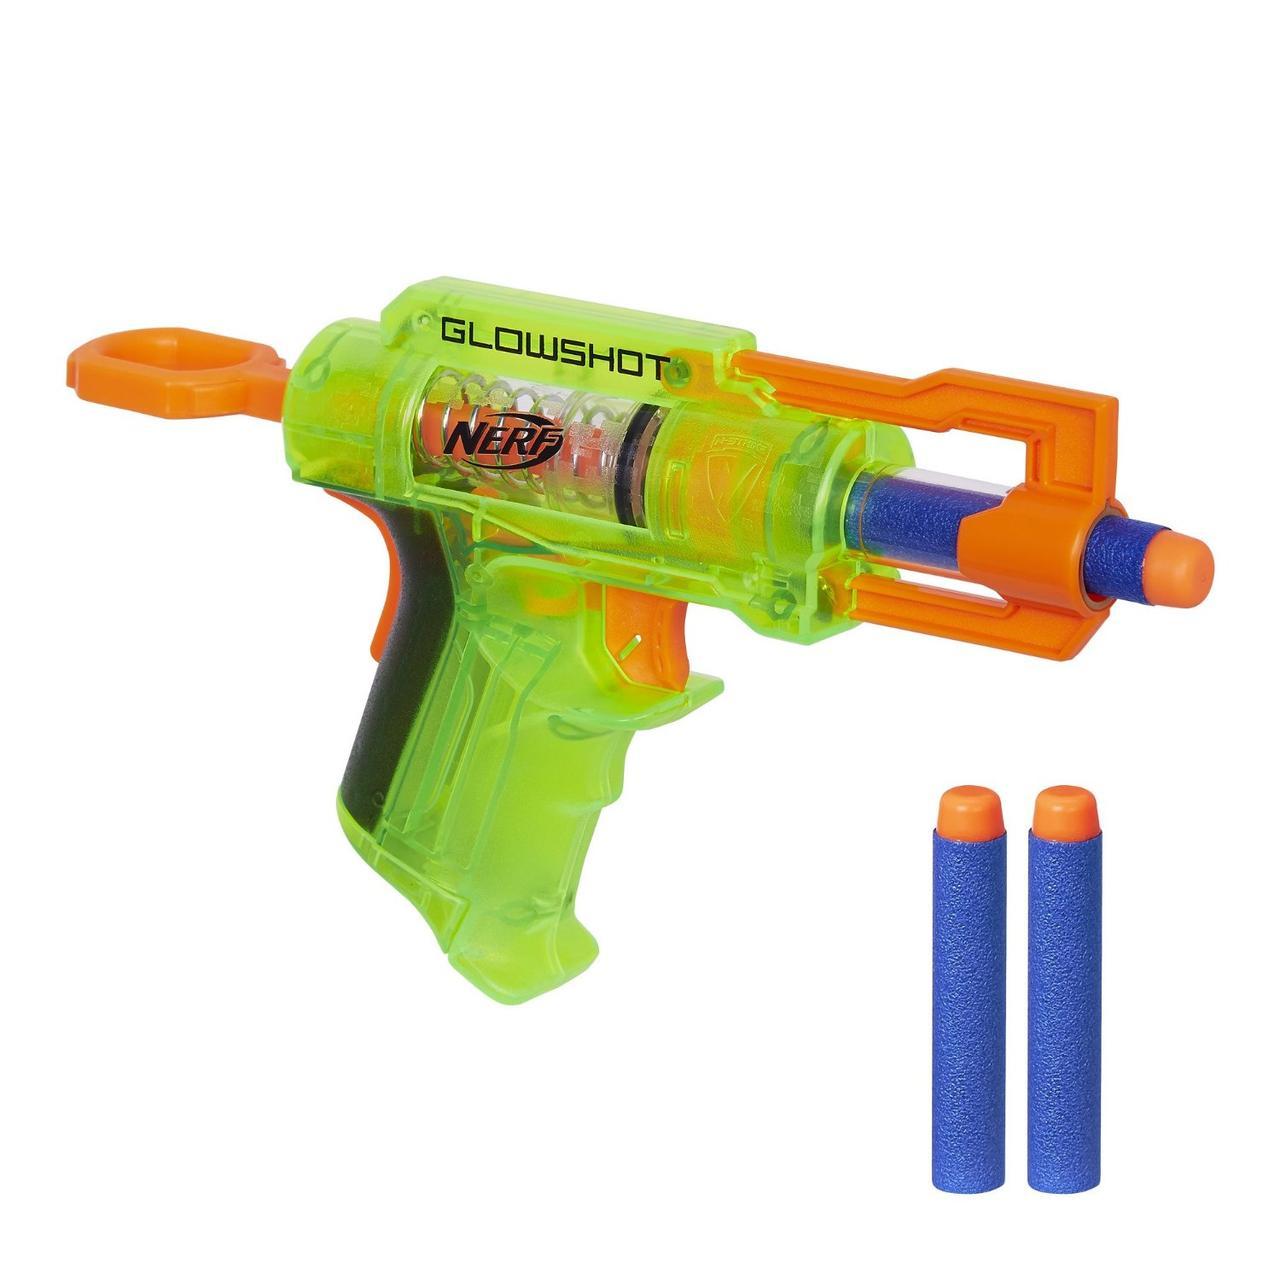 Nerf Бластер Элит Глоушот зеленый N-Strike GlowShot Blaster B4615